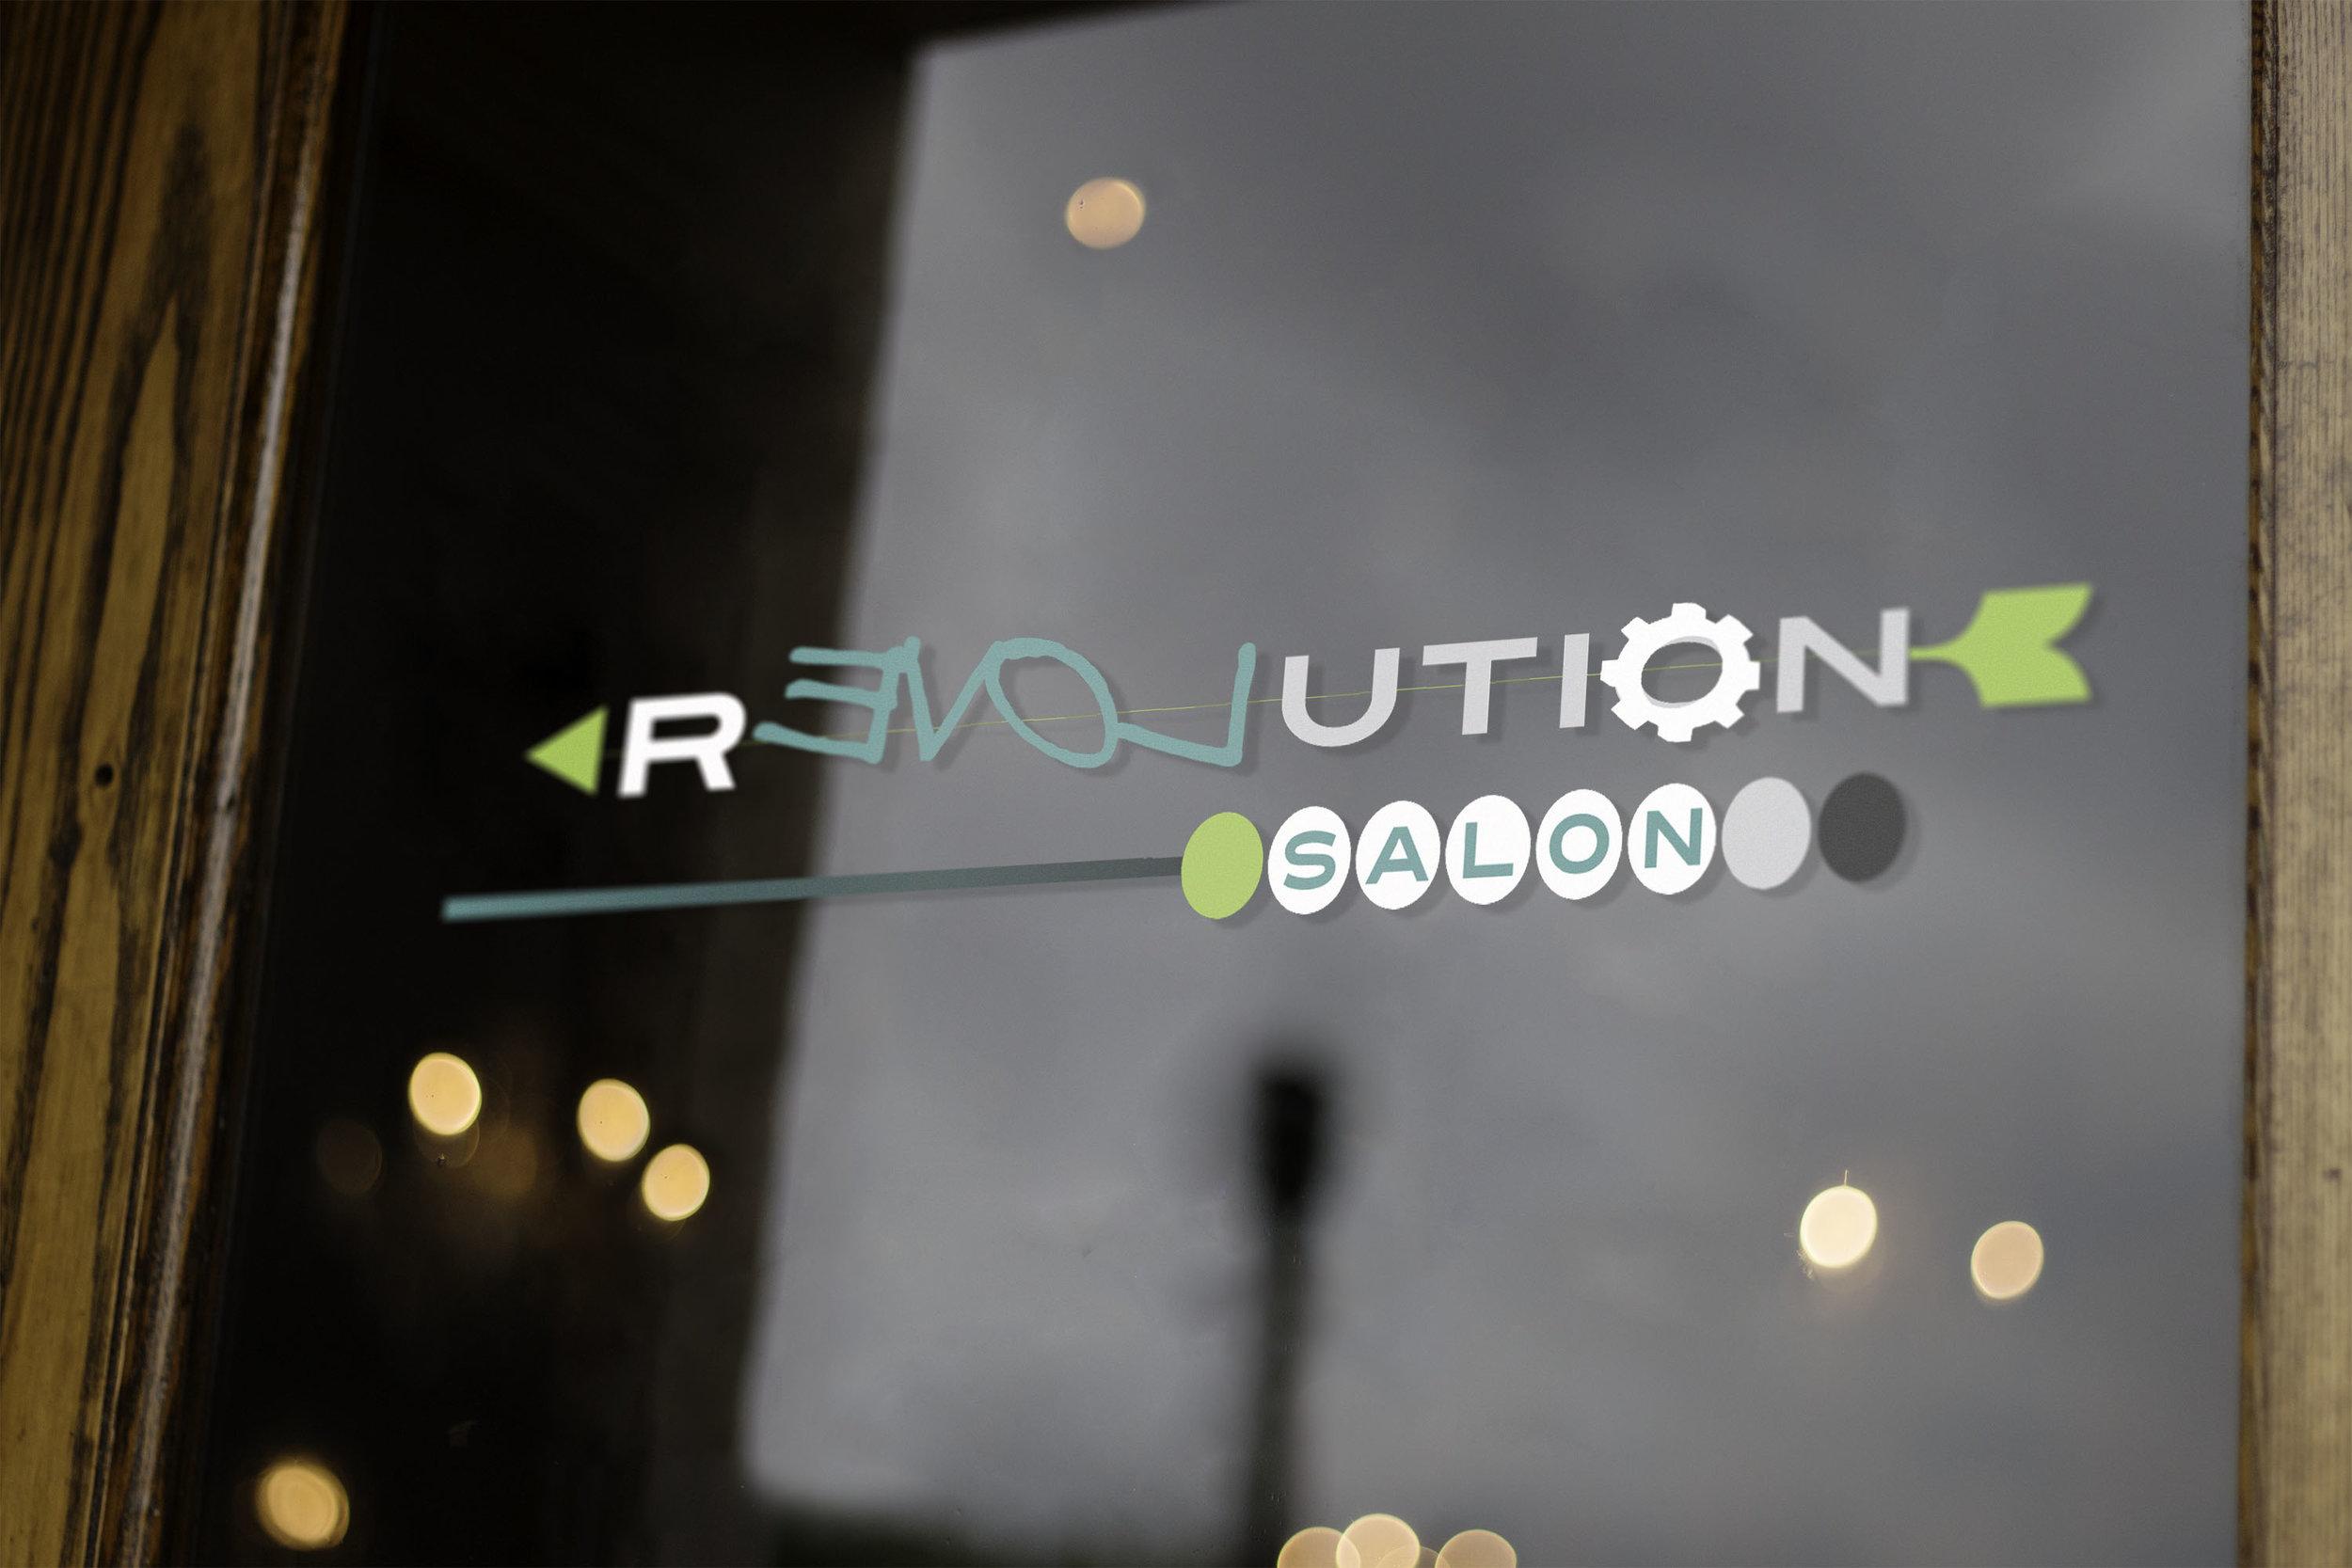 revolutionwindow.jpg